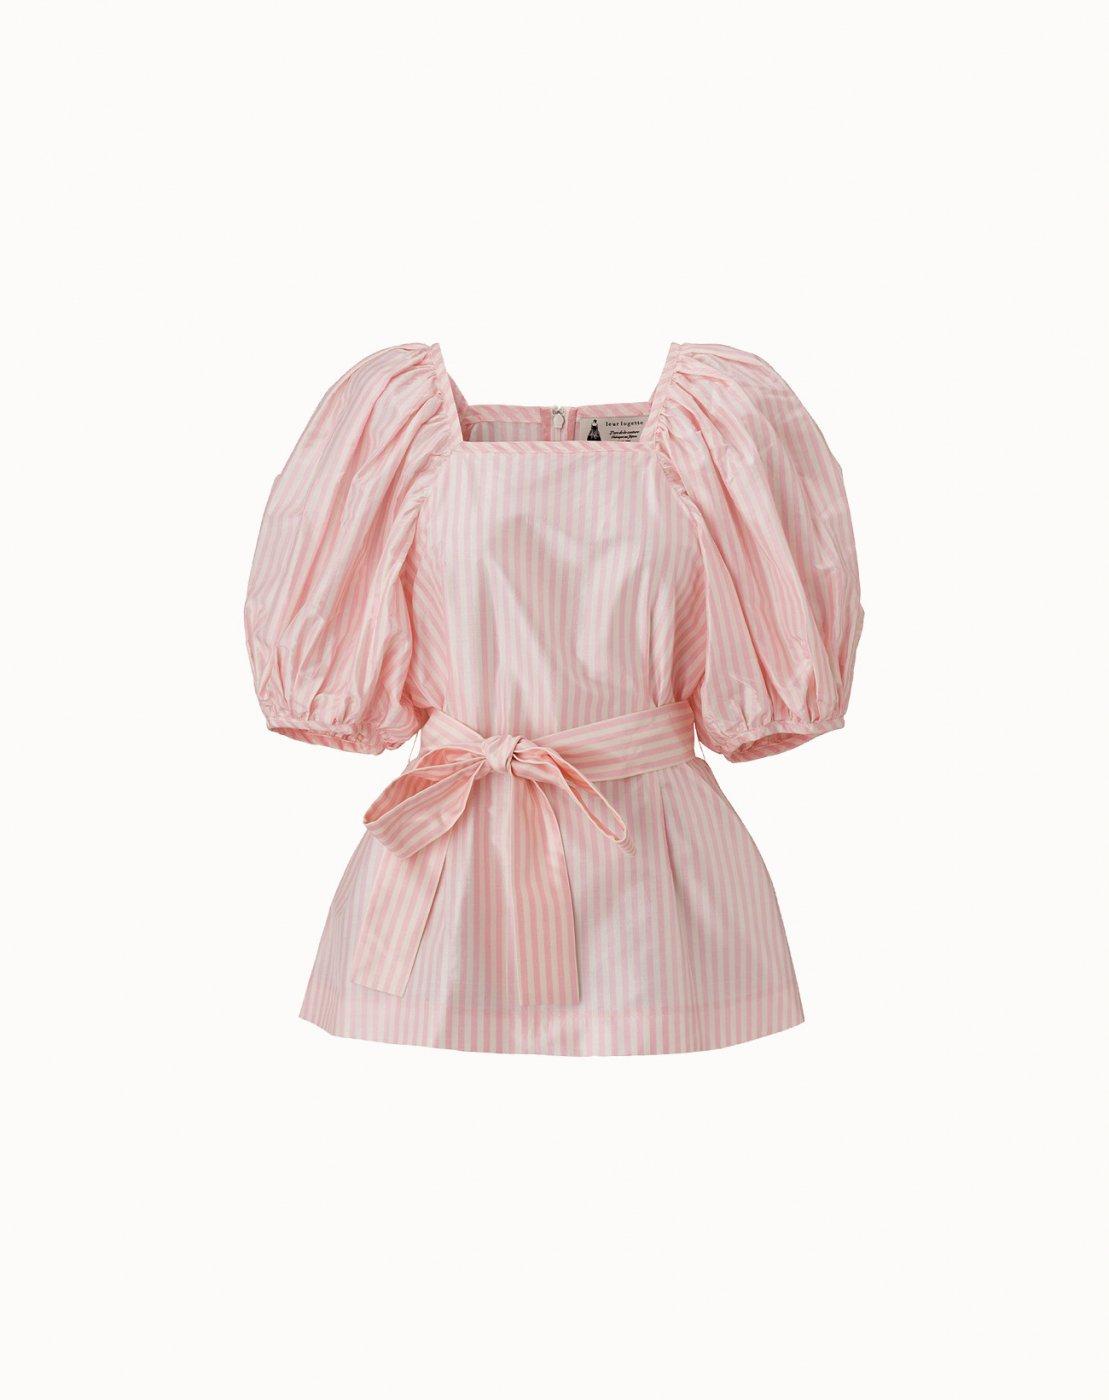 leur logette - Strope Taffeta Top - Pink